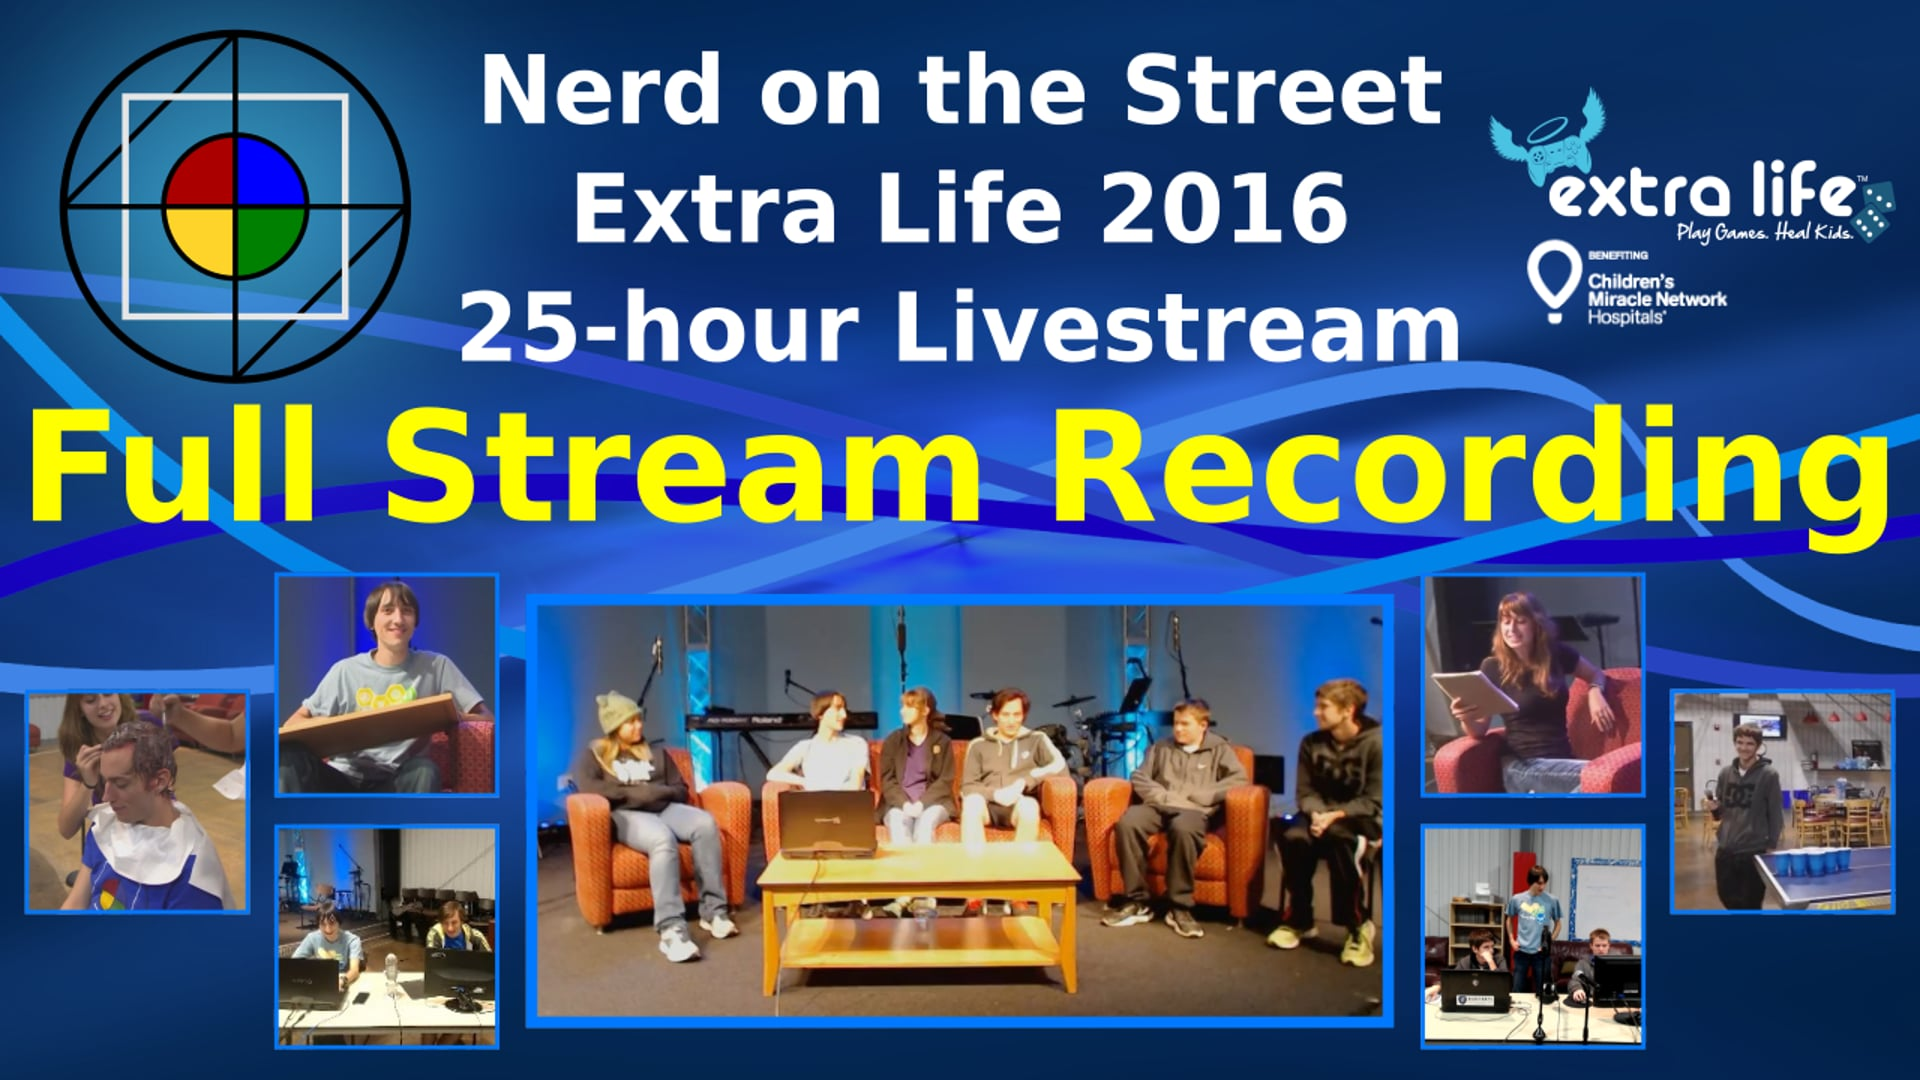 Full Stream Recording (Part 2 of 2) - NOTS Extra Life 2016